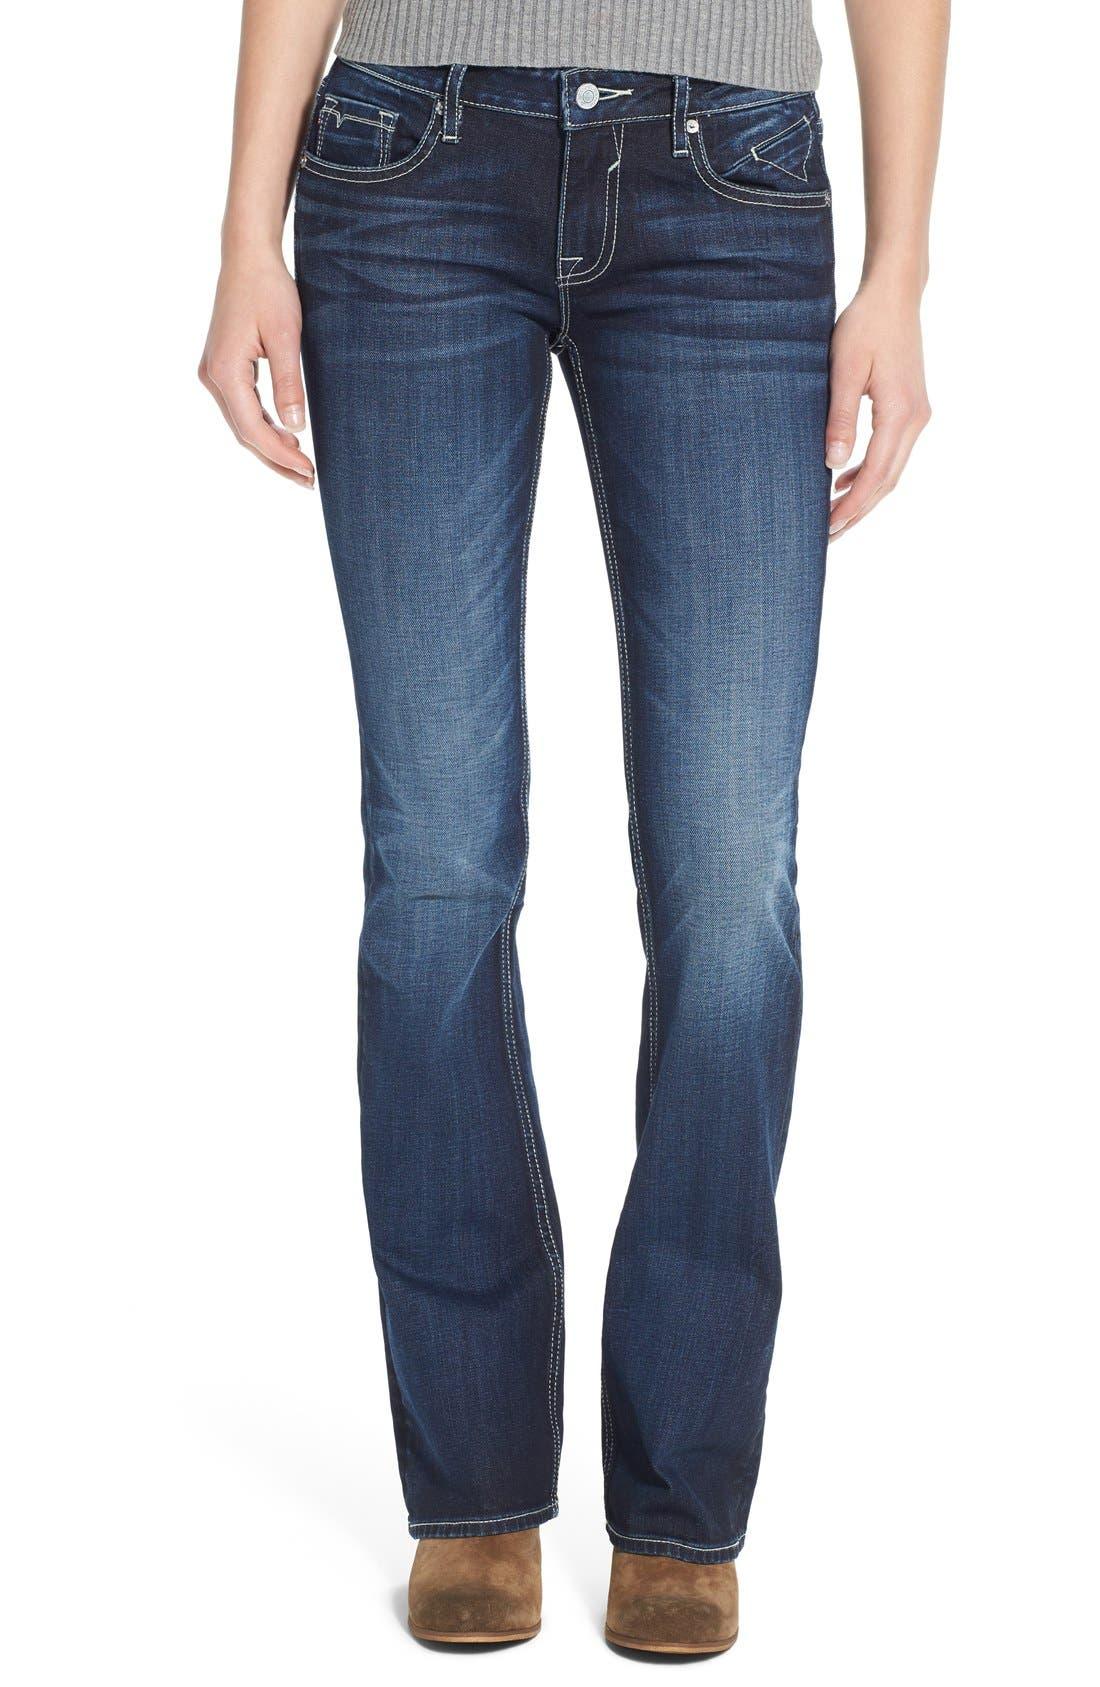 Alternate Image 1 Selected - Vigoss Bootcut Jeans